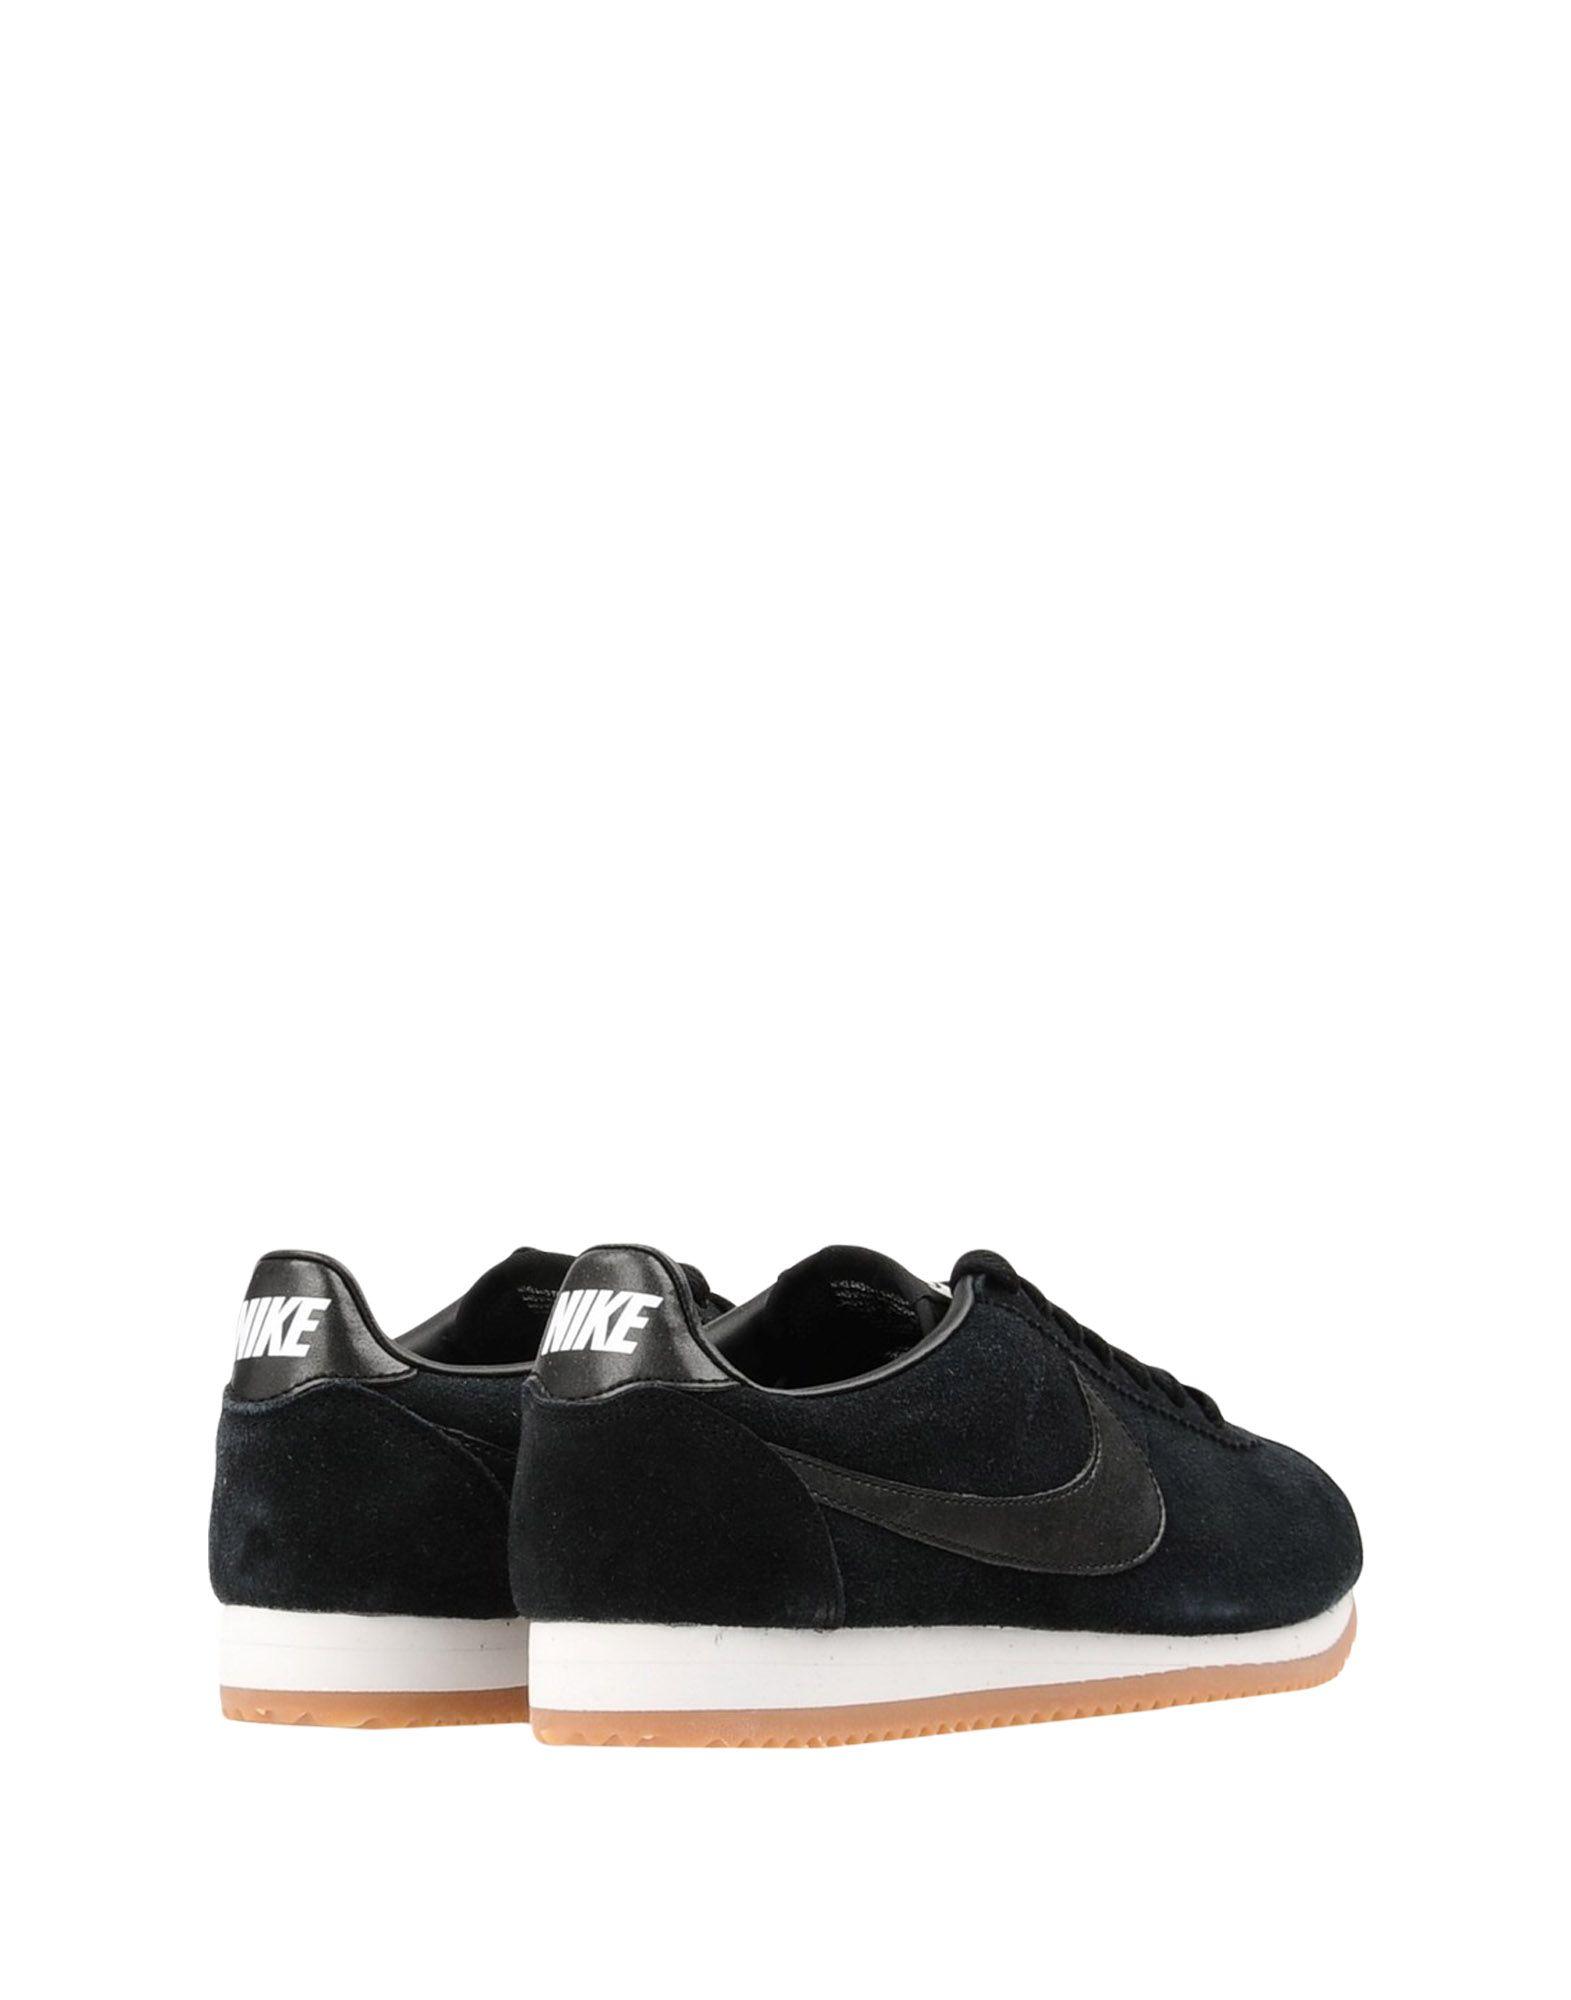 Sneakers Nike Classic Cortez Suede - Femme - Sneakers Nike sur